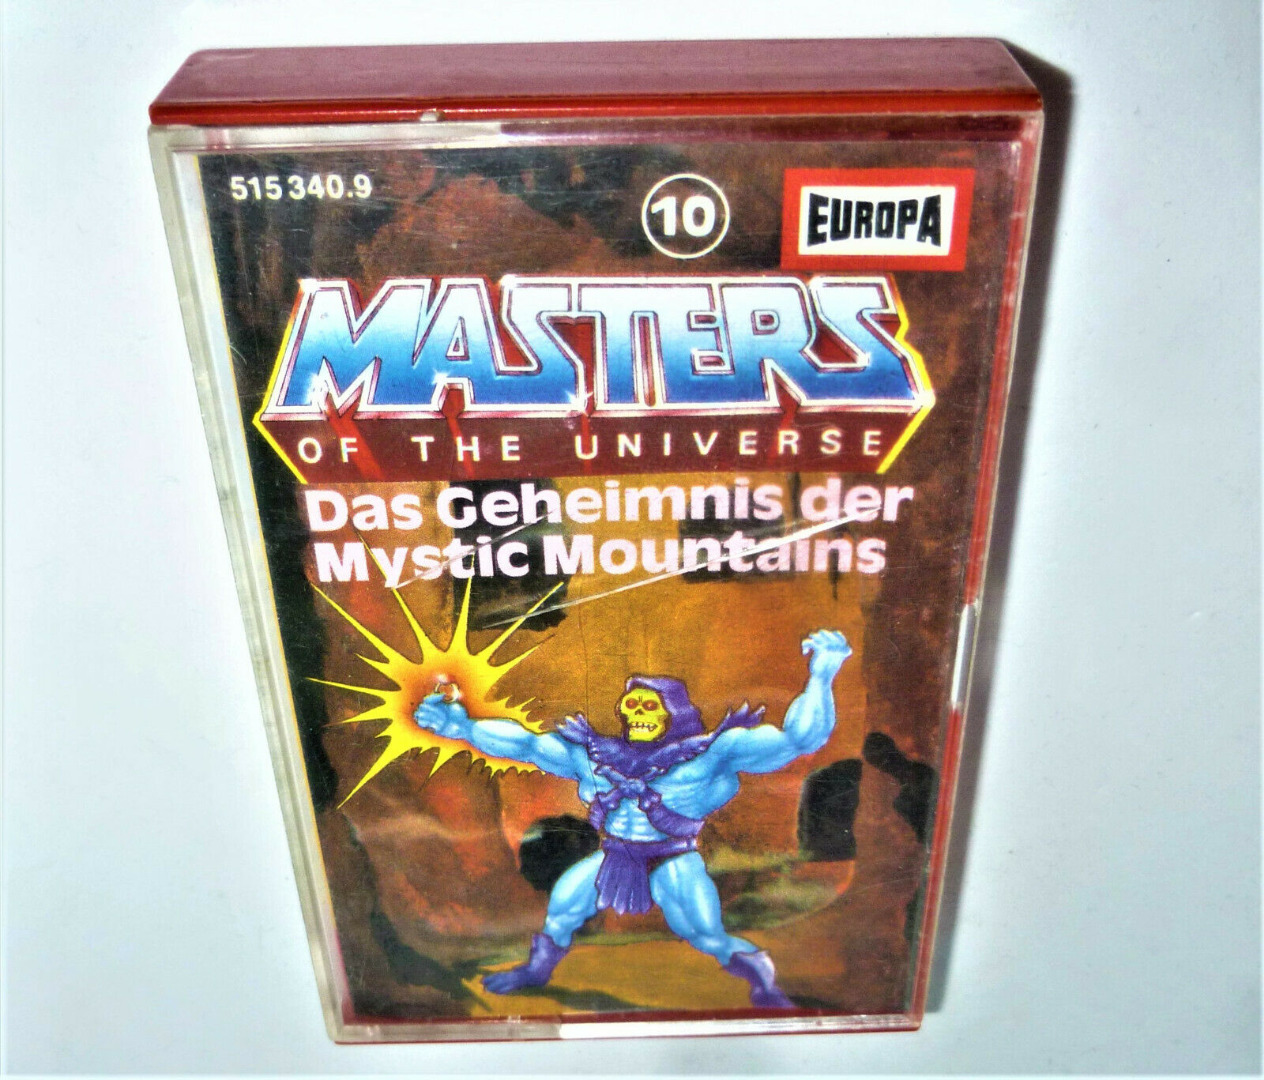 Das Geheimnis der Mystic Mountains - Nr. 10 - Masters of the Universe / He-Man Hörspiel - 1